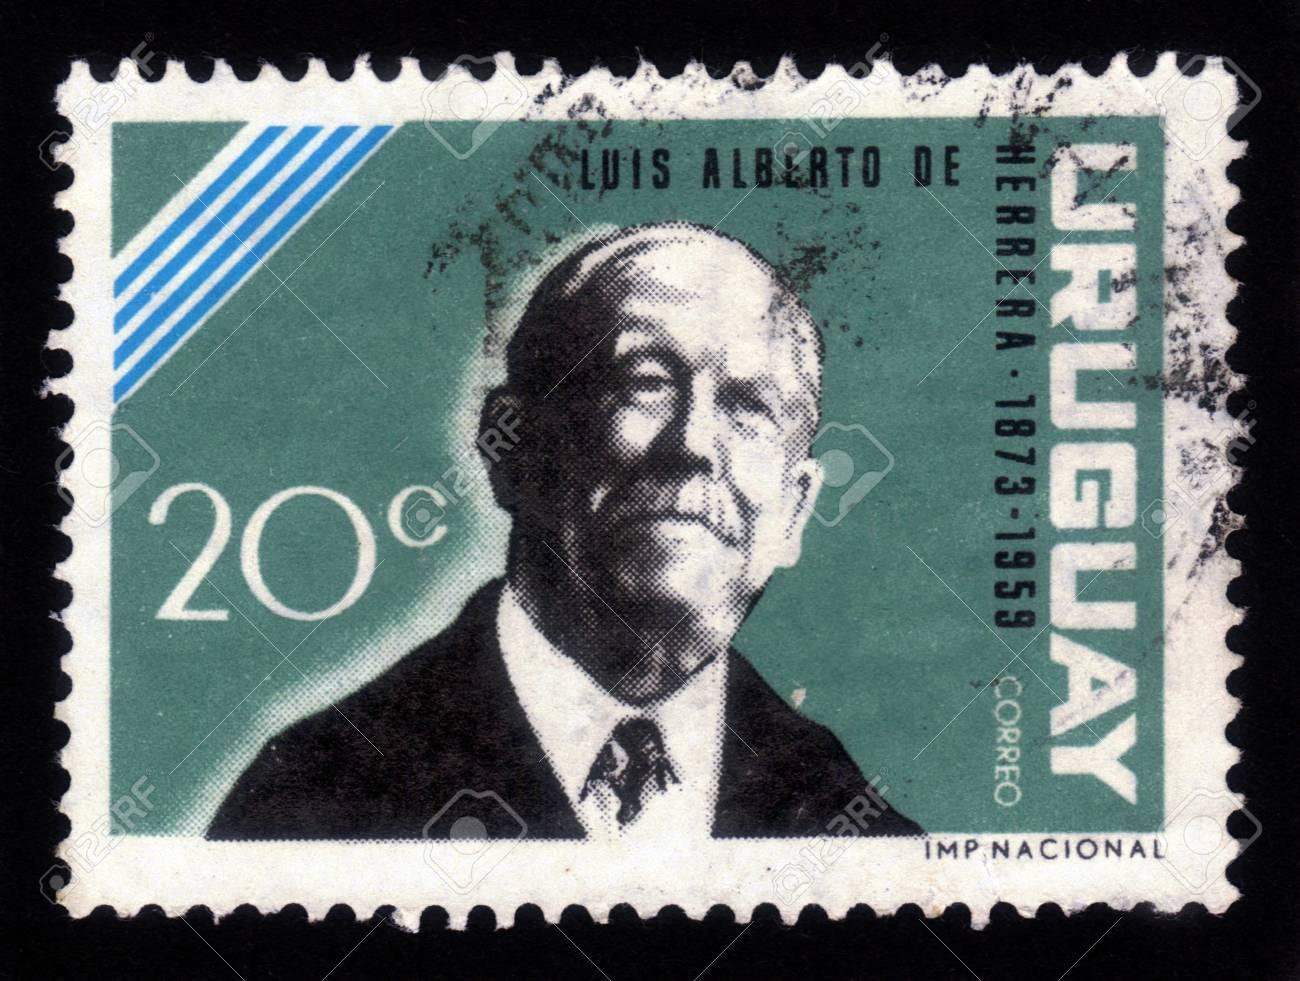 URUGUAY - CIRCA 1964  A stamp printed in Uruguay, shows portrait of Luis Alberto de Herrera  1873-1959  a Uruguayan lawyer, diplomat, journalist and politician, circa 1964 Stock Photo - 17202155